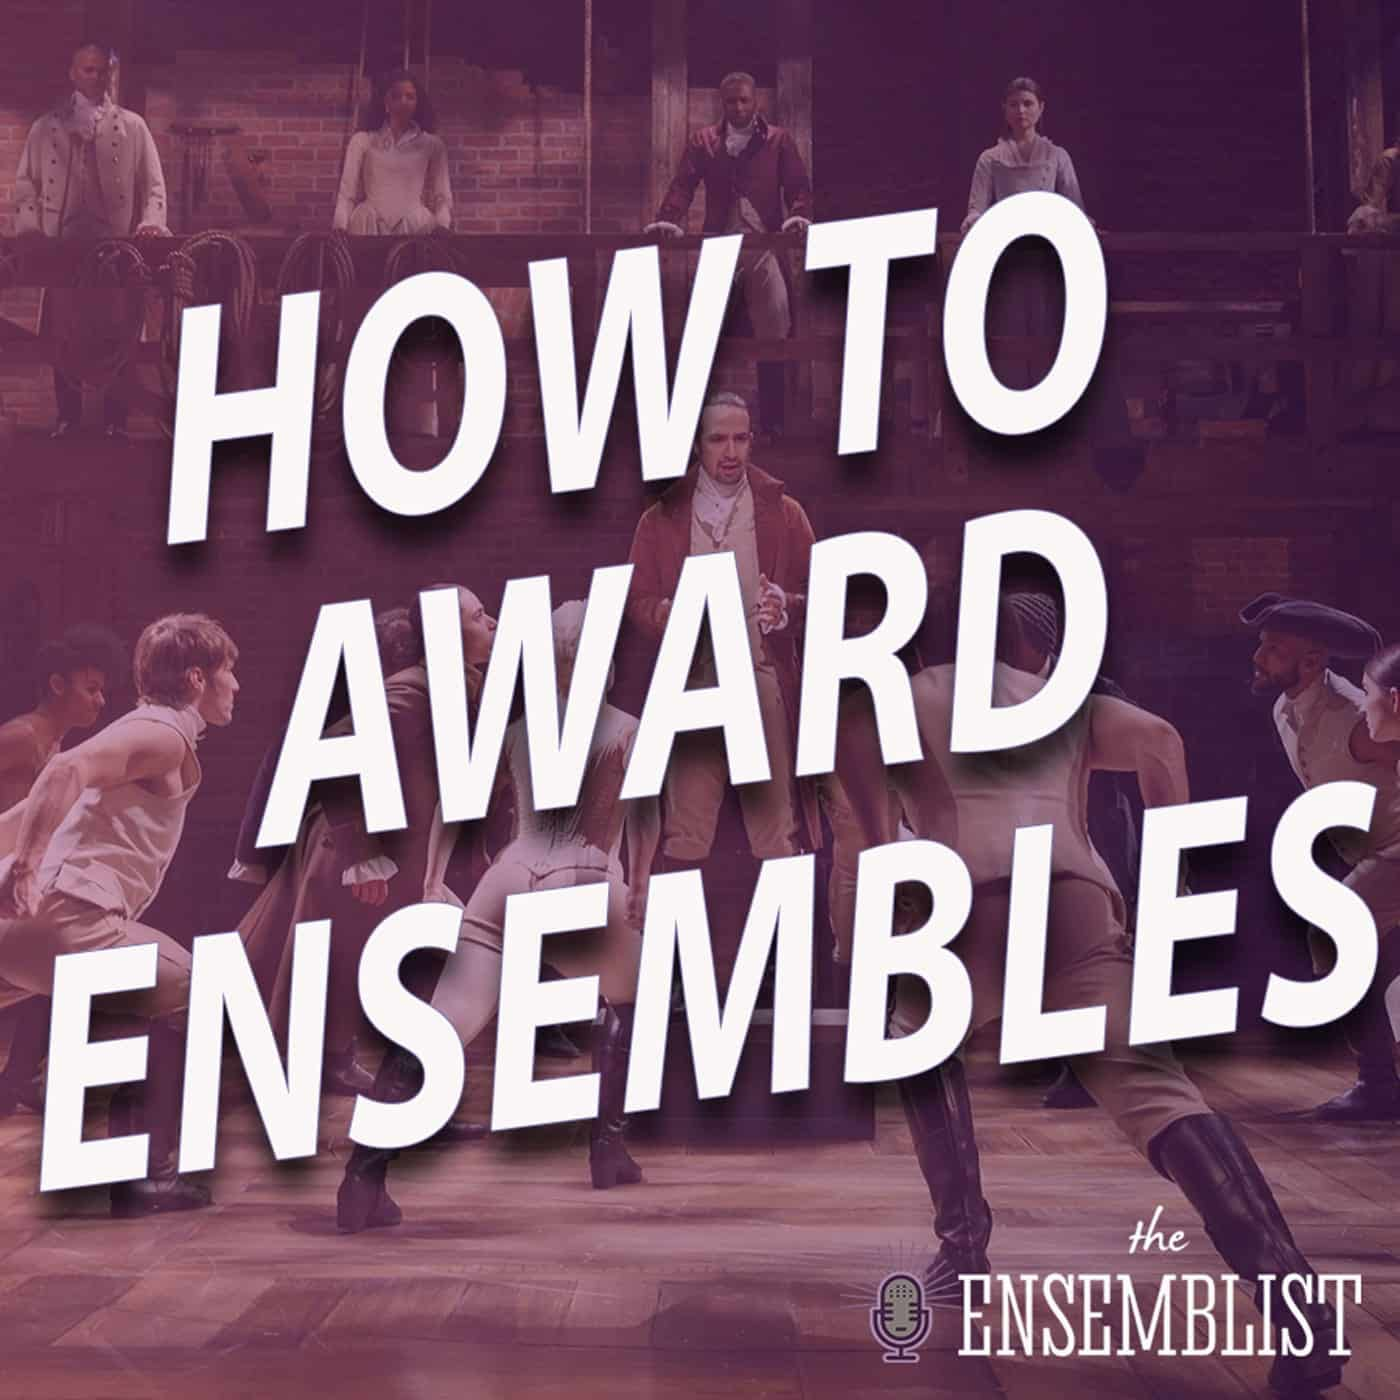 #503 - How to Award Ensembles (feat. Jack Smart)